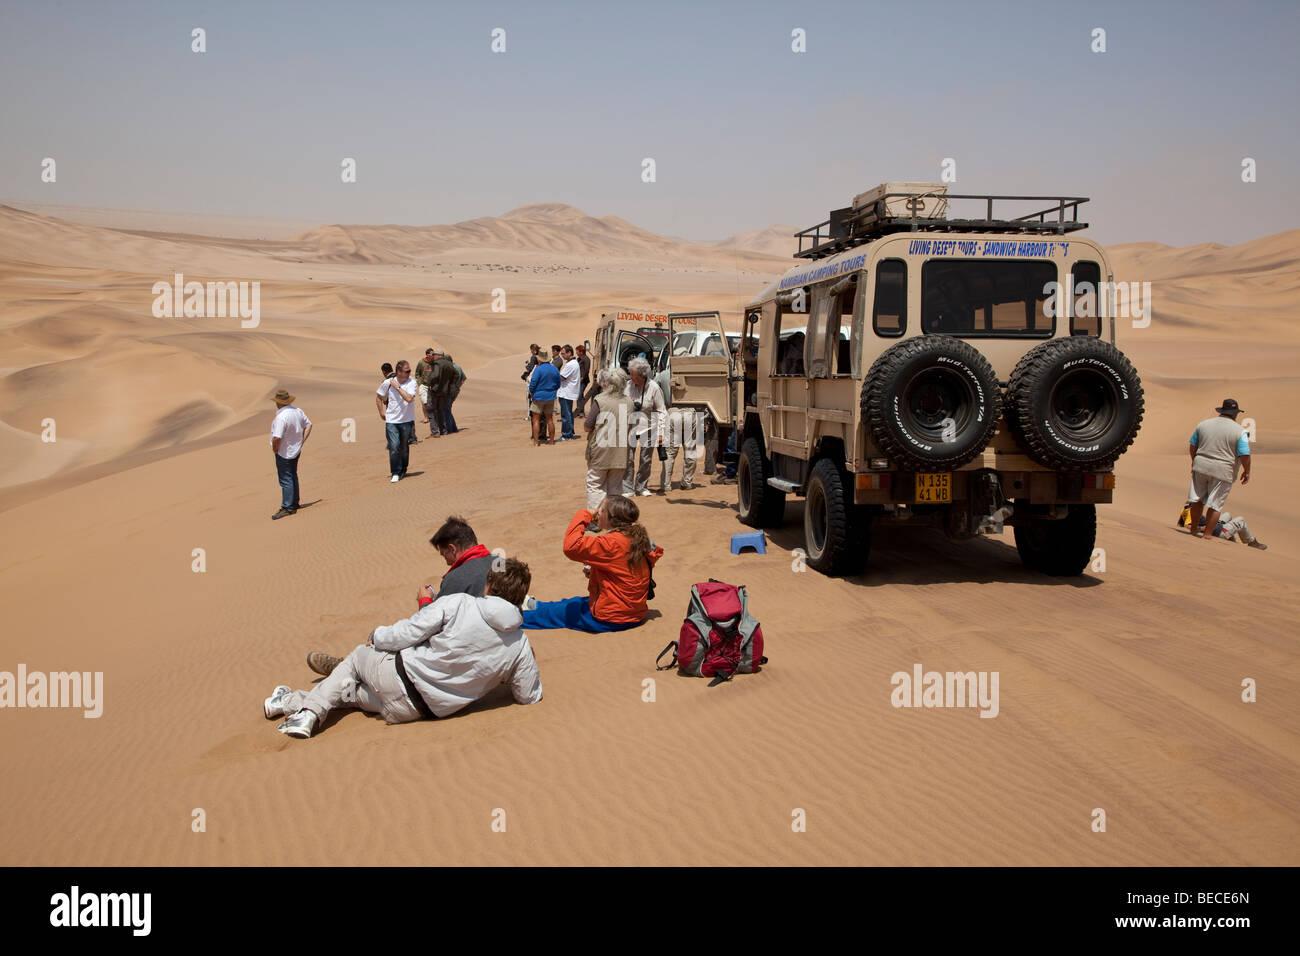 Tourists among sand dunes near Swakopmund, Namib Desert, Namibia, Africa - Stock Image